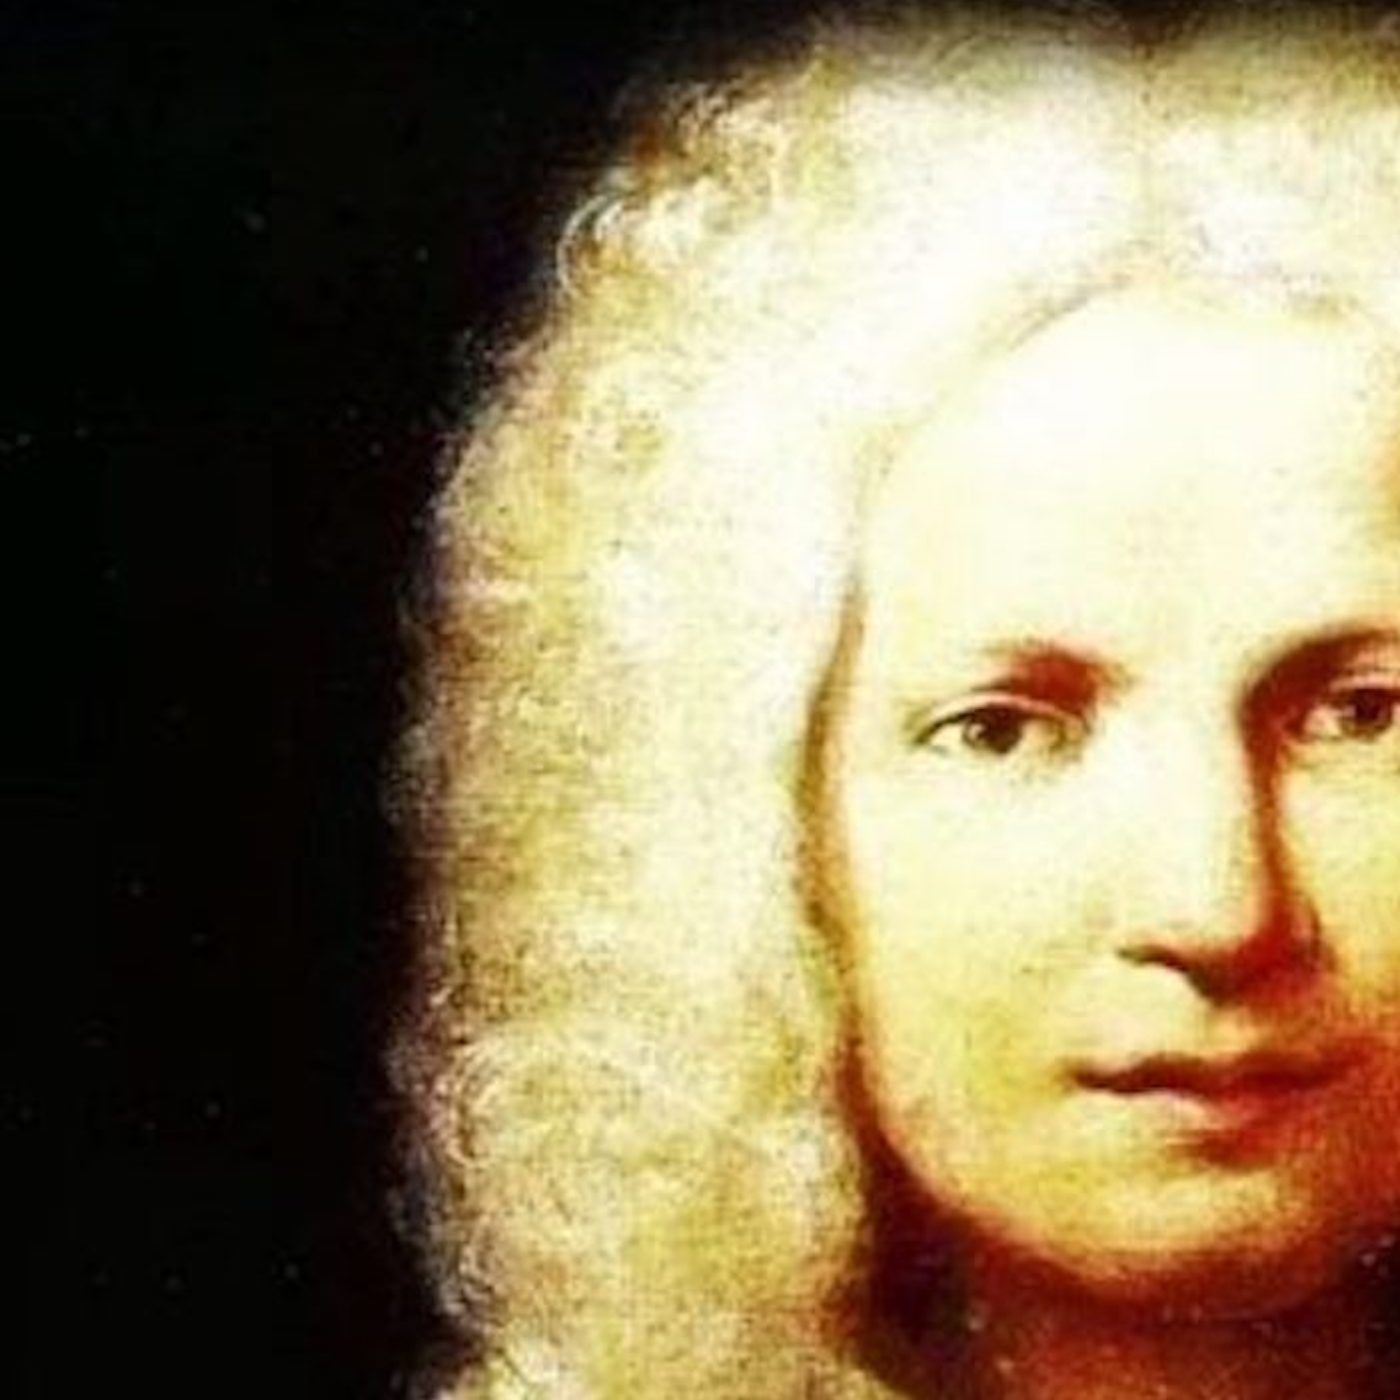 Where Did We Put Vivaldi?